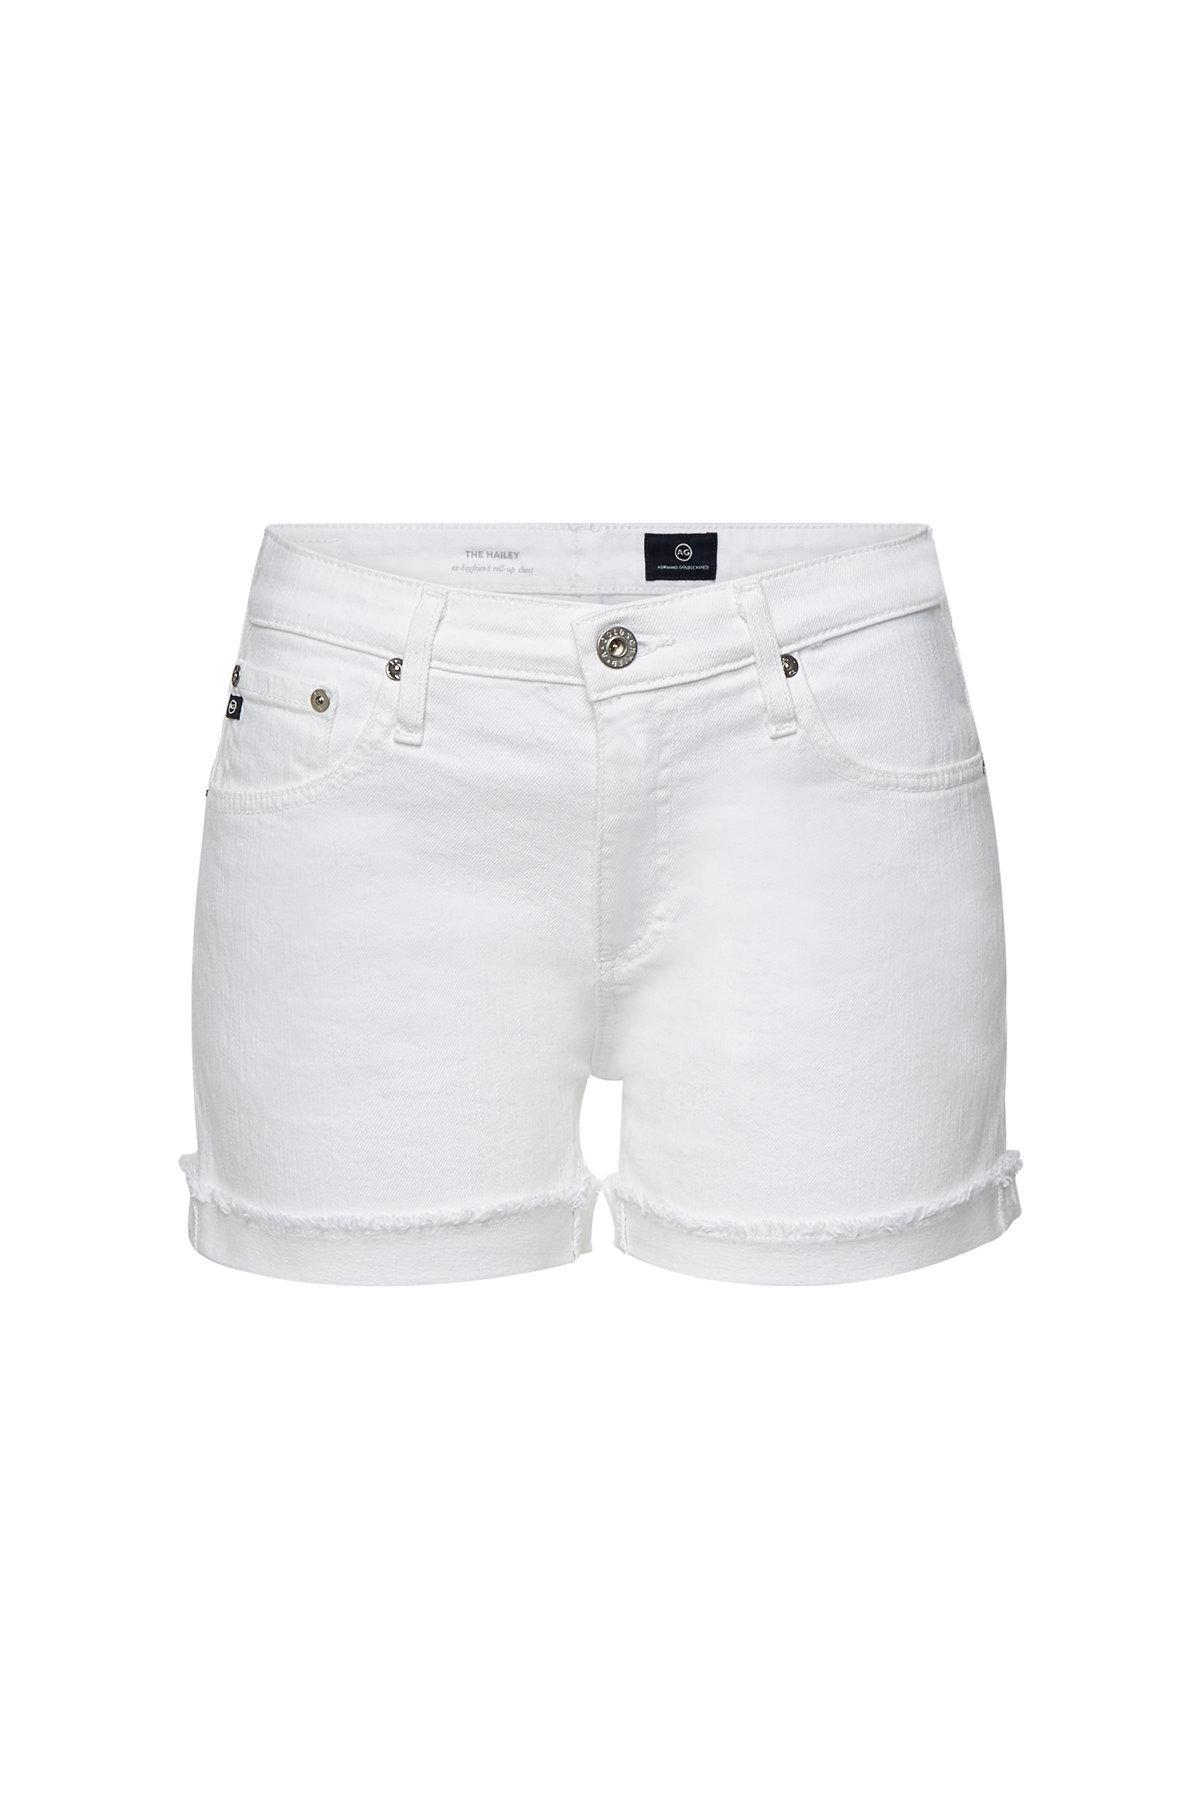 22cca13756 Ag Jeans Hailey Denim Shorts in Blue - Lyst